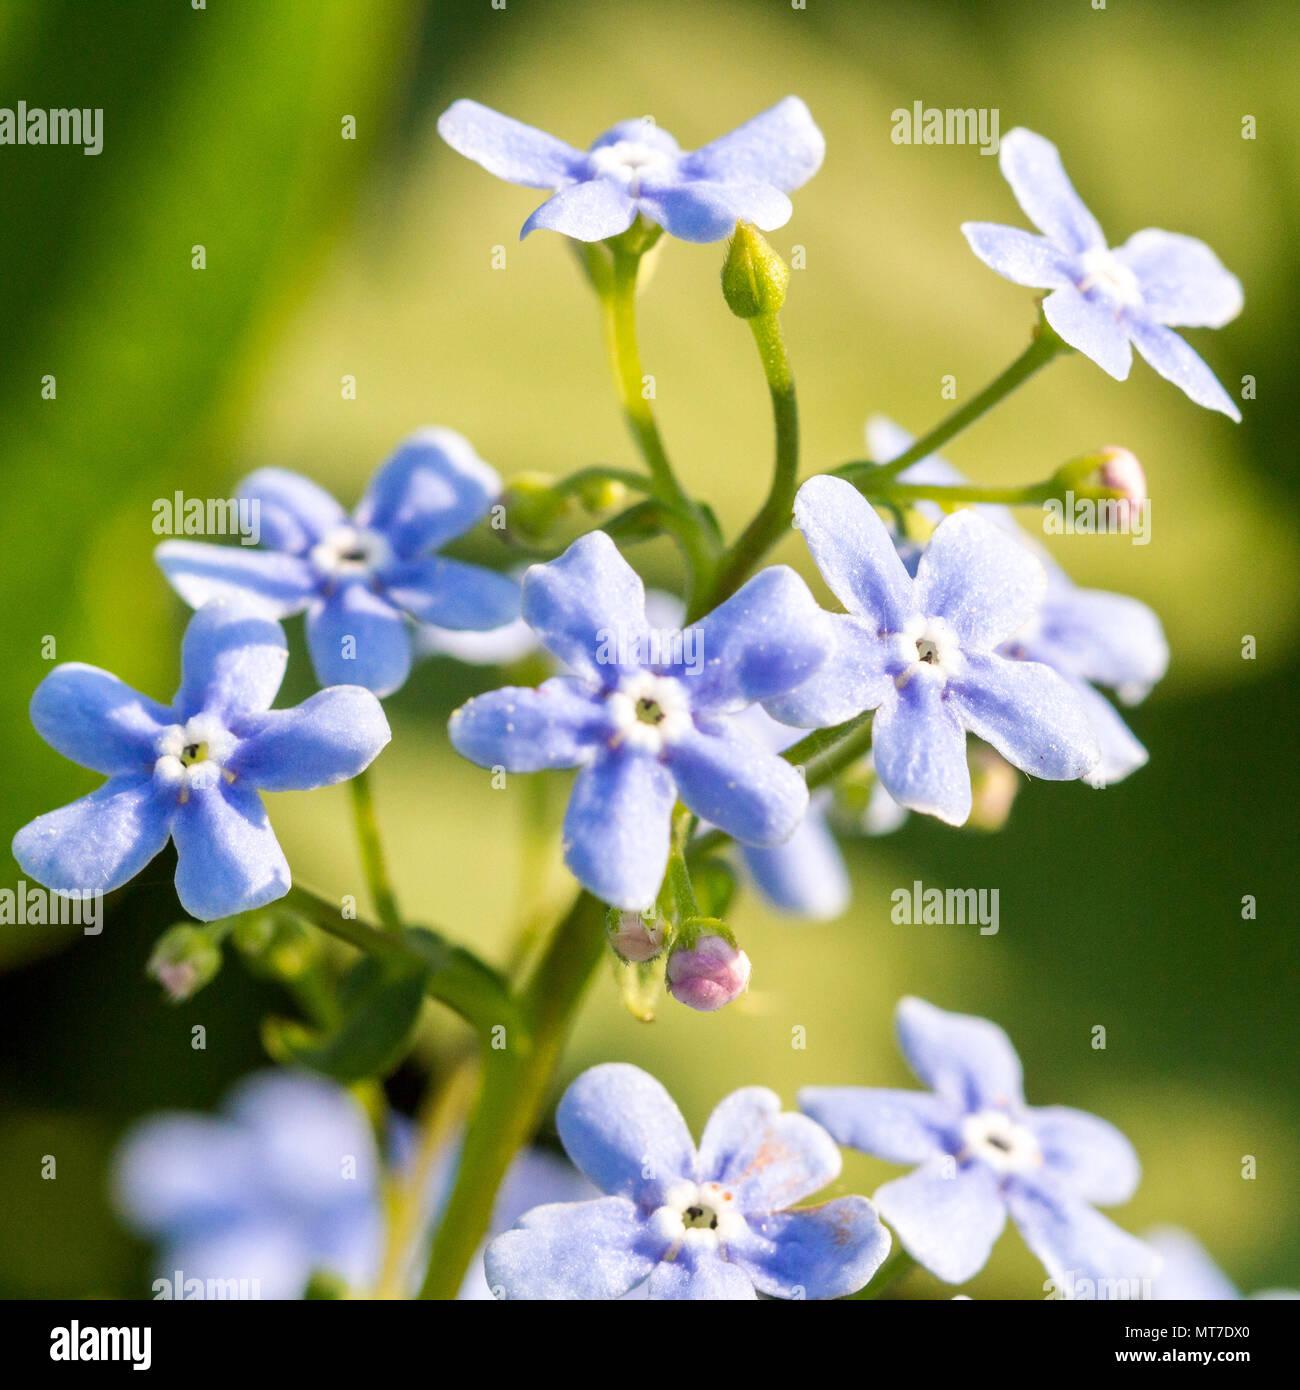 Gentle blue flowers forget-me-not (Myosotis sylvatica) on green natural background - Stock Image